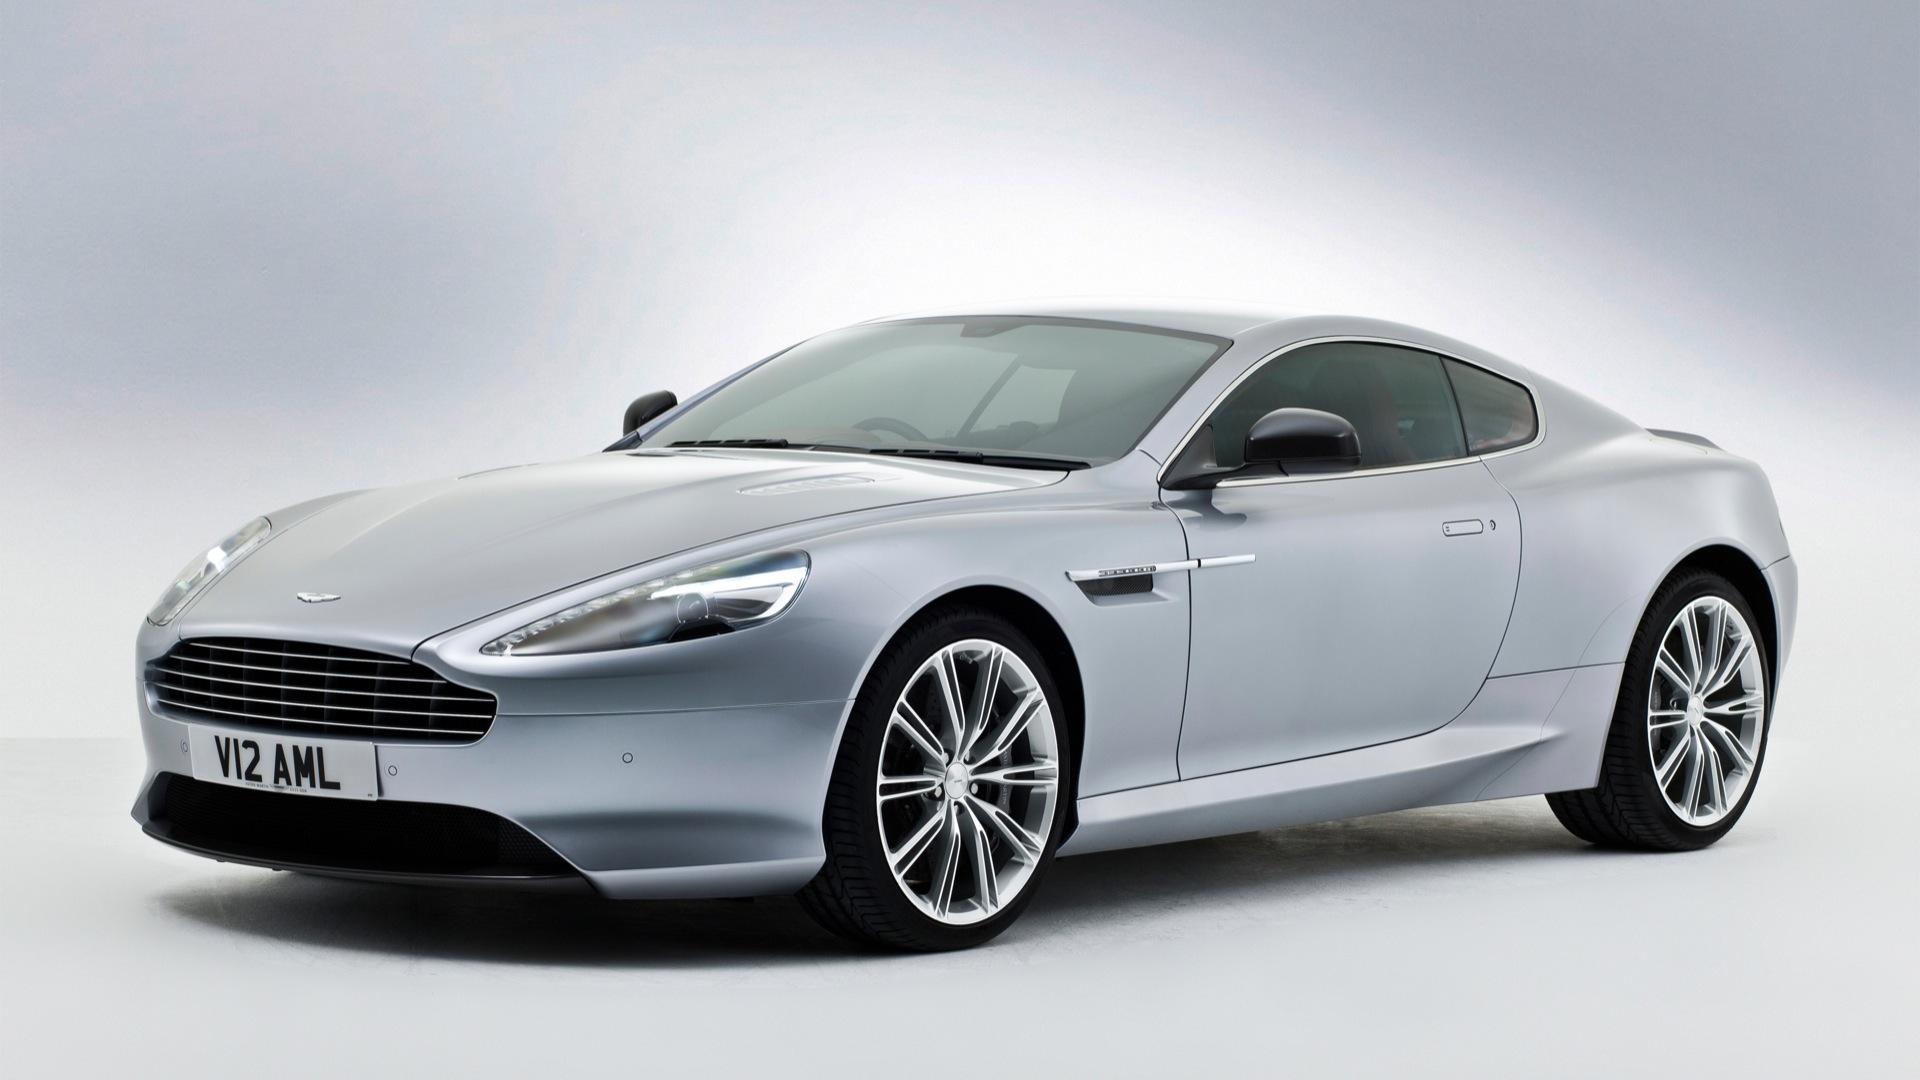 Aston Martin DB9 Exterior Car s Overdrive